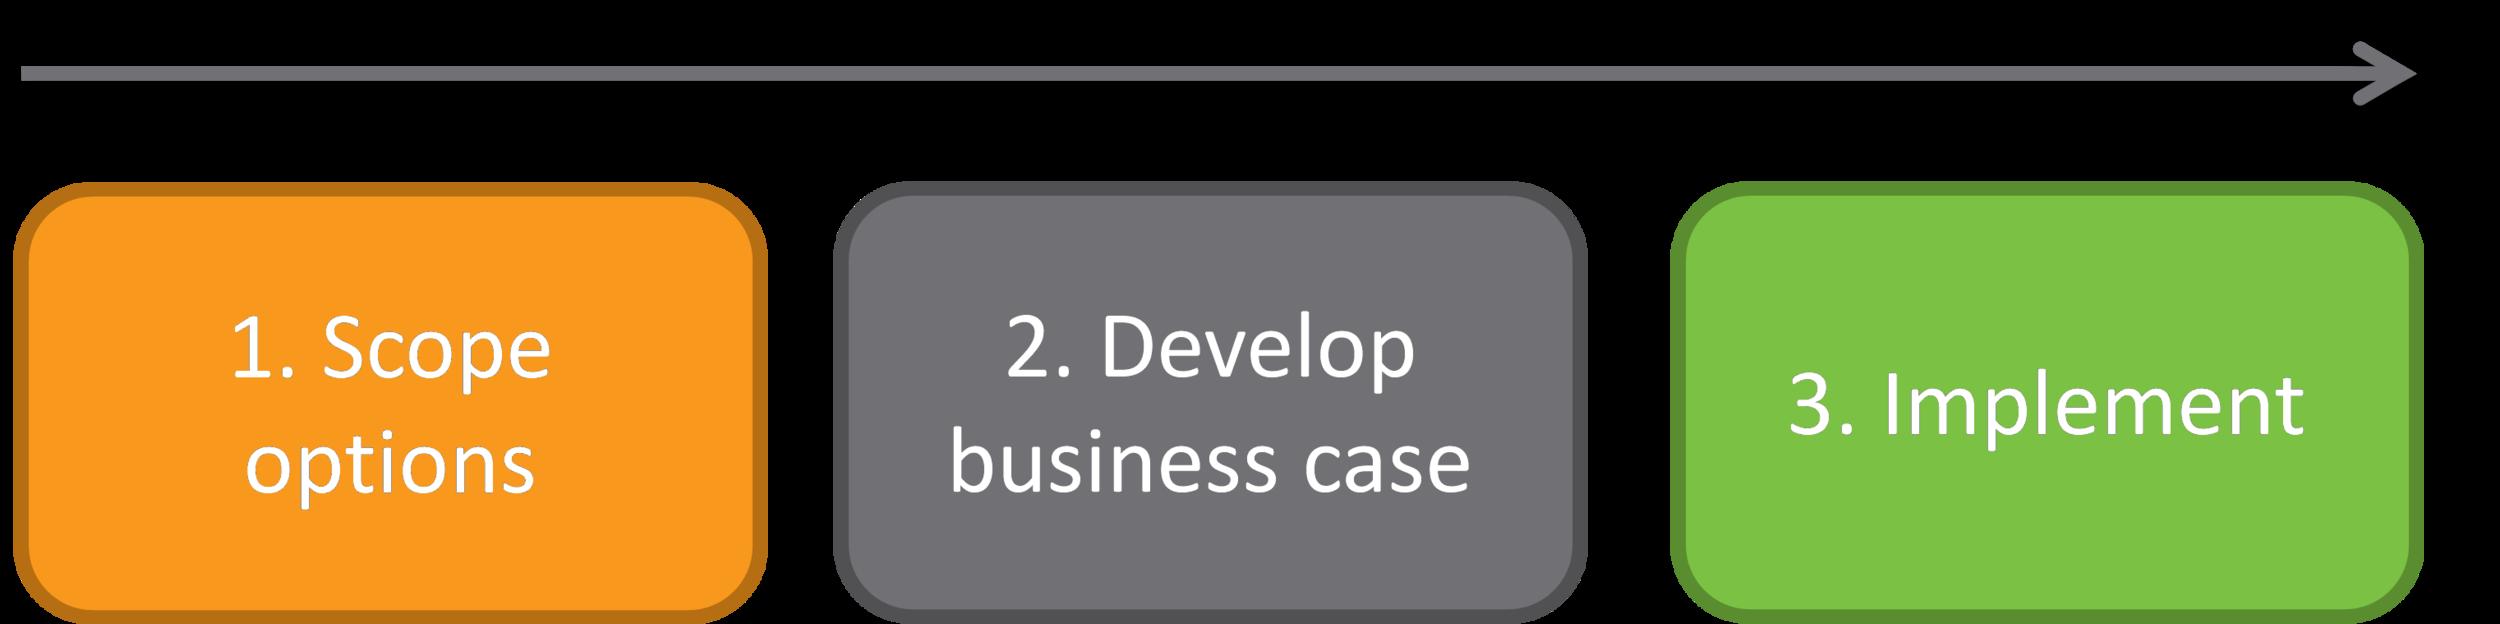 Figure 7: Steps for establishing complex shared services and MSO arrangements